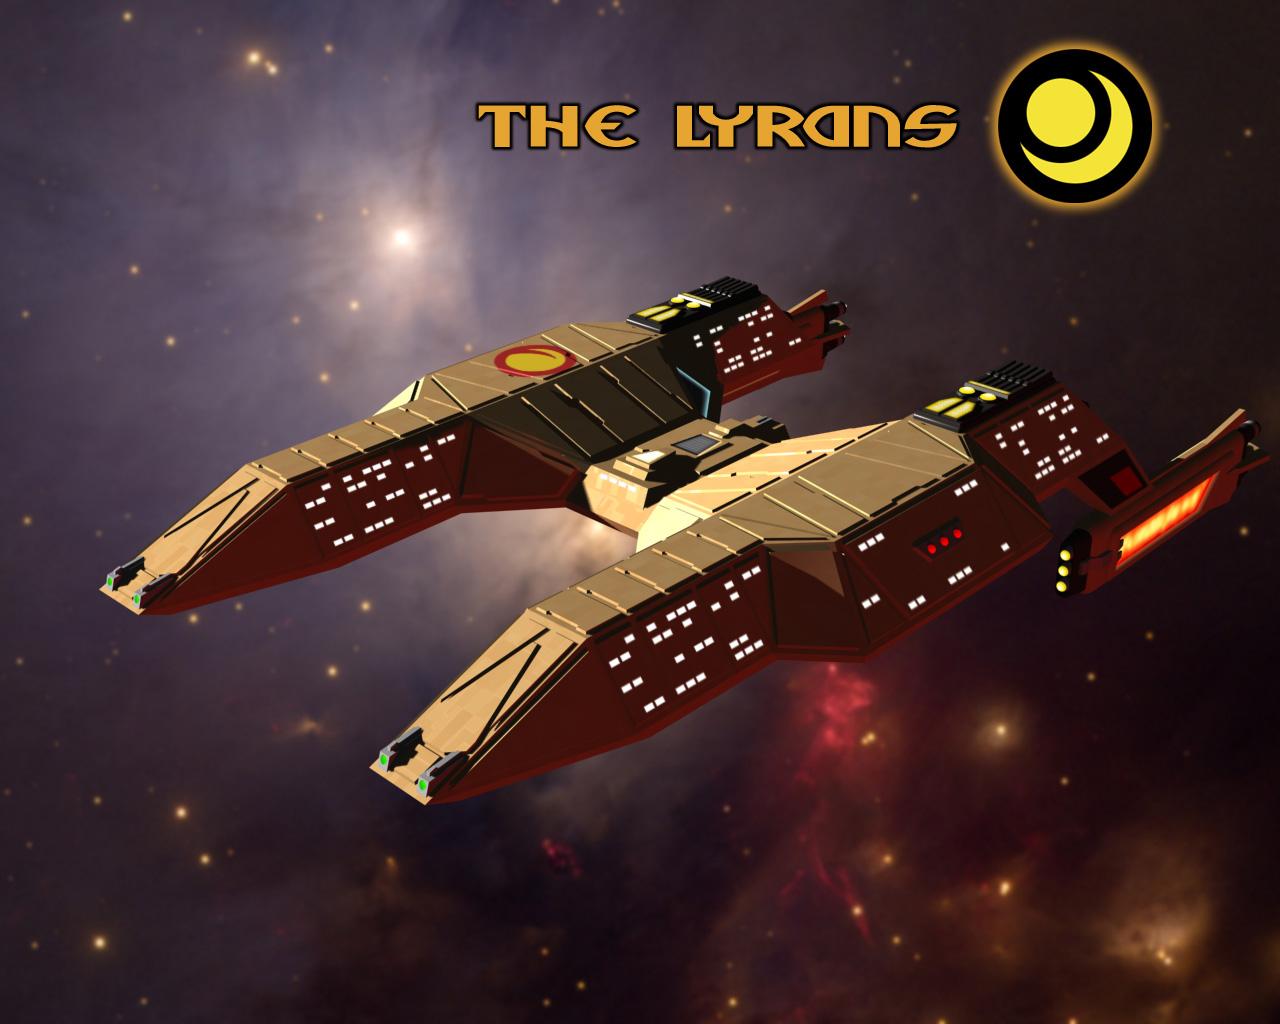 Best 52 Lyran Wallpaper on HipWallpaper Lyran Wallpaper Lyran 1280x1024